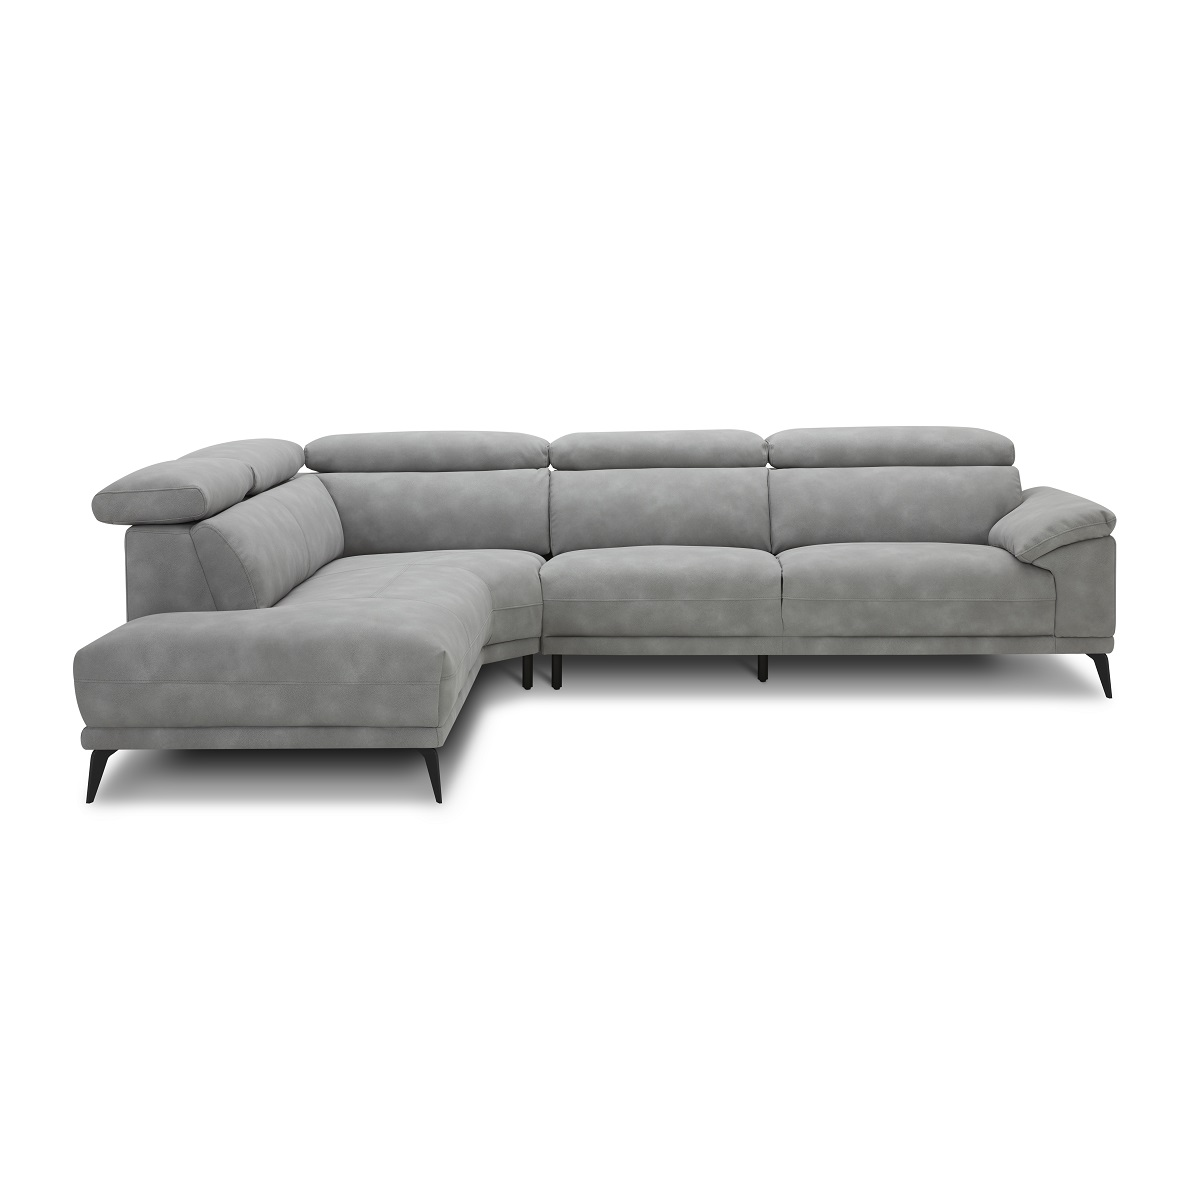 Montero LHF Corner Sofa - Grey